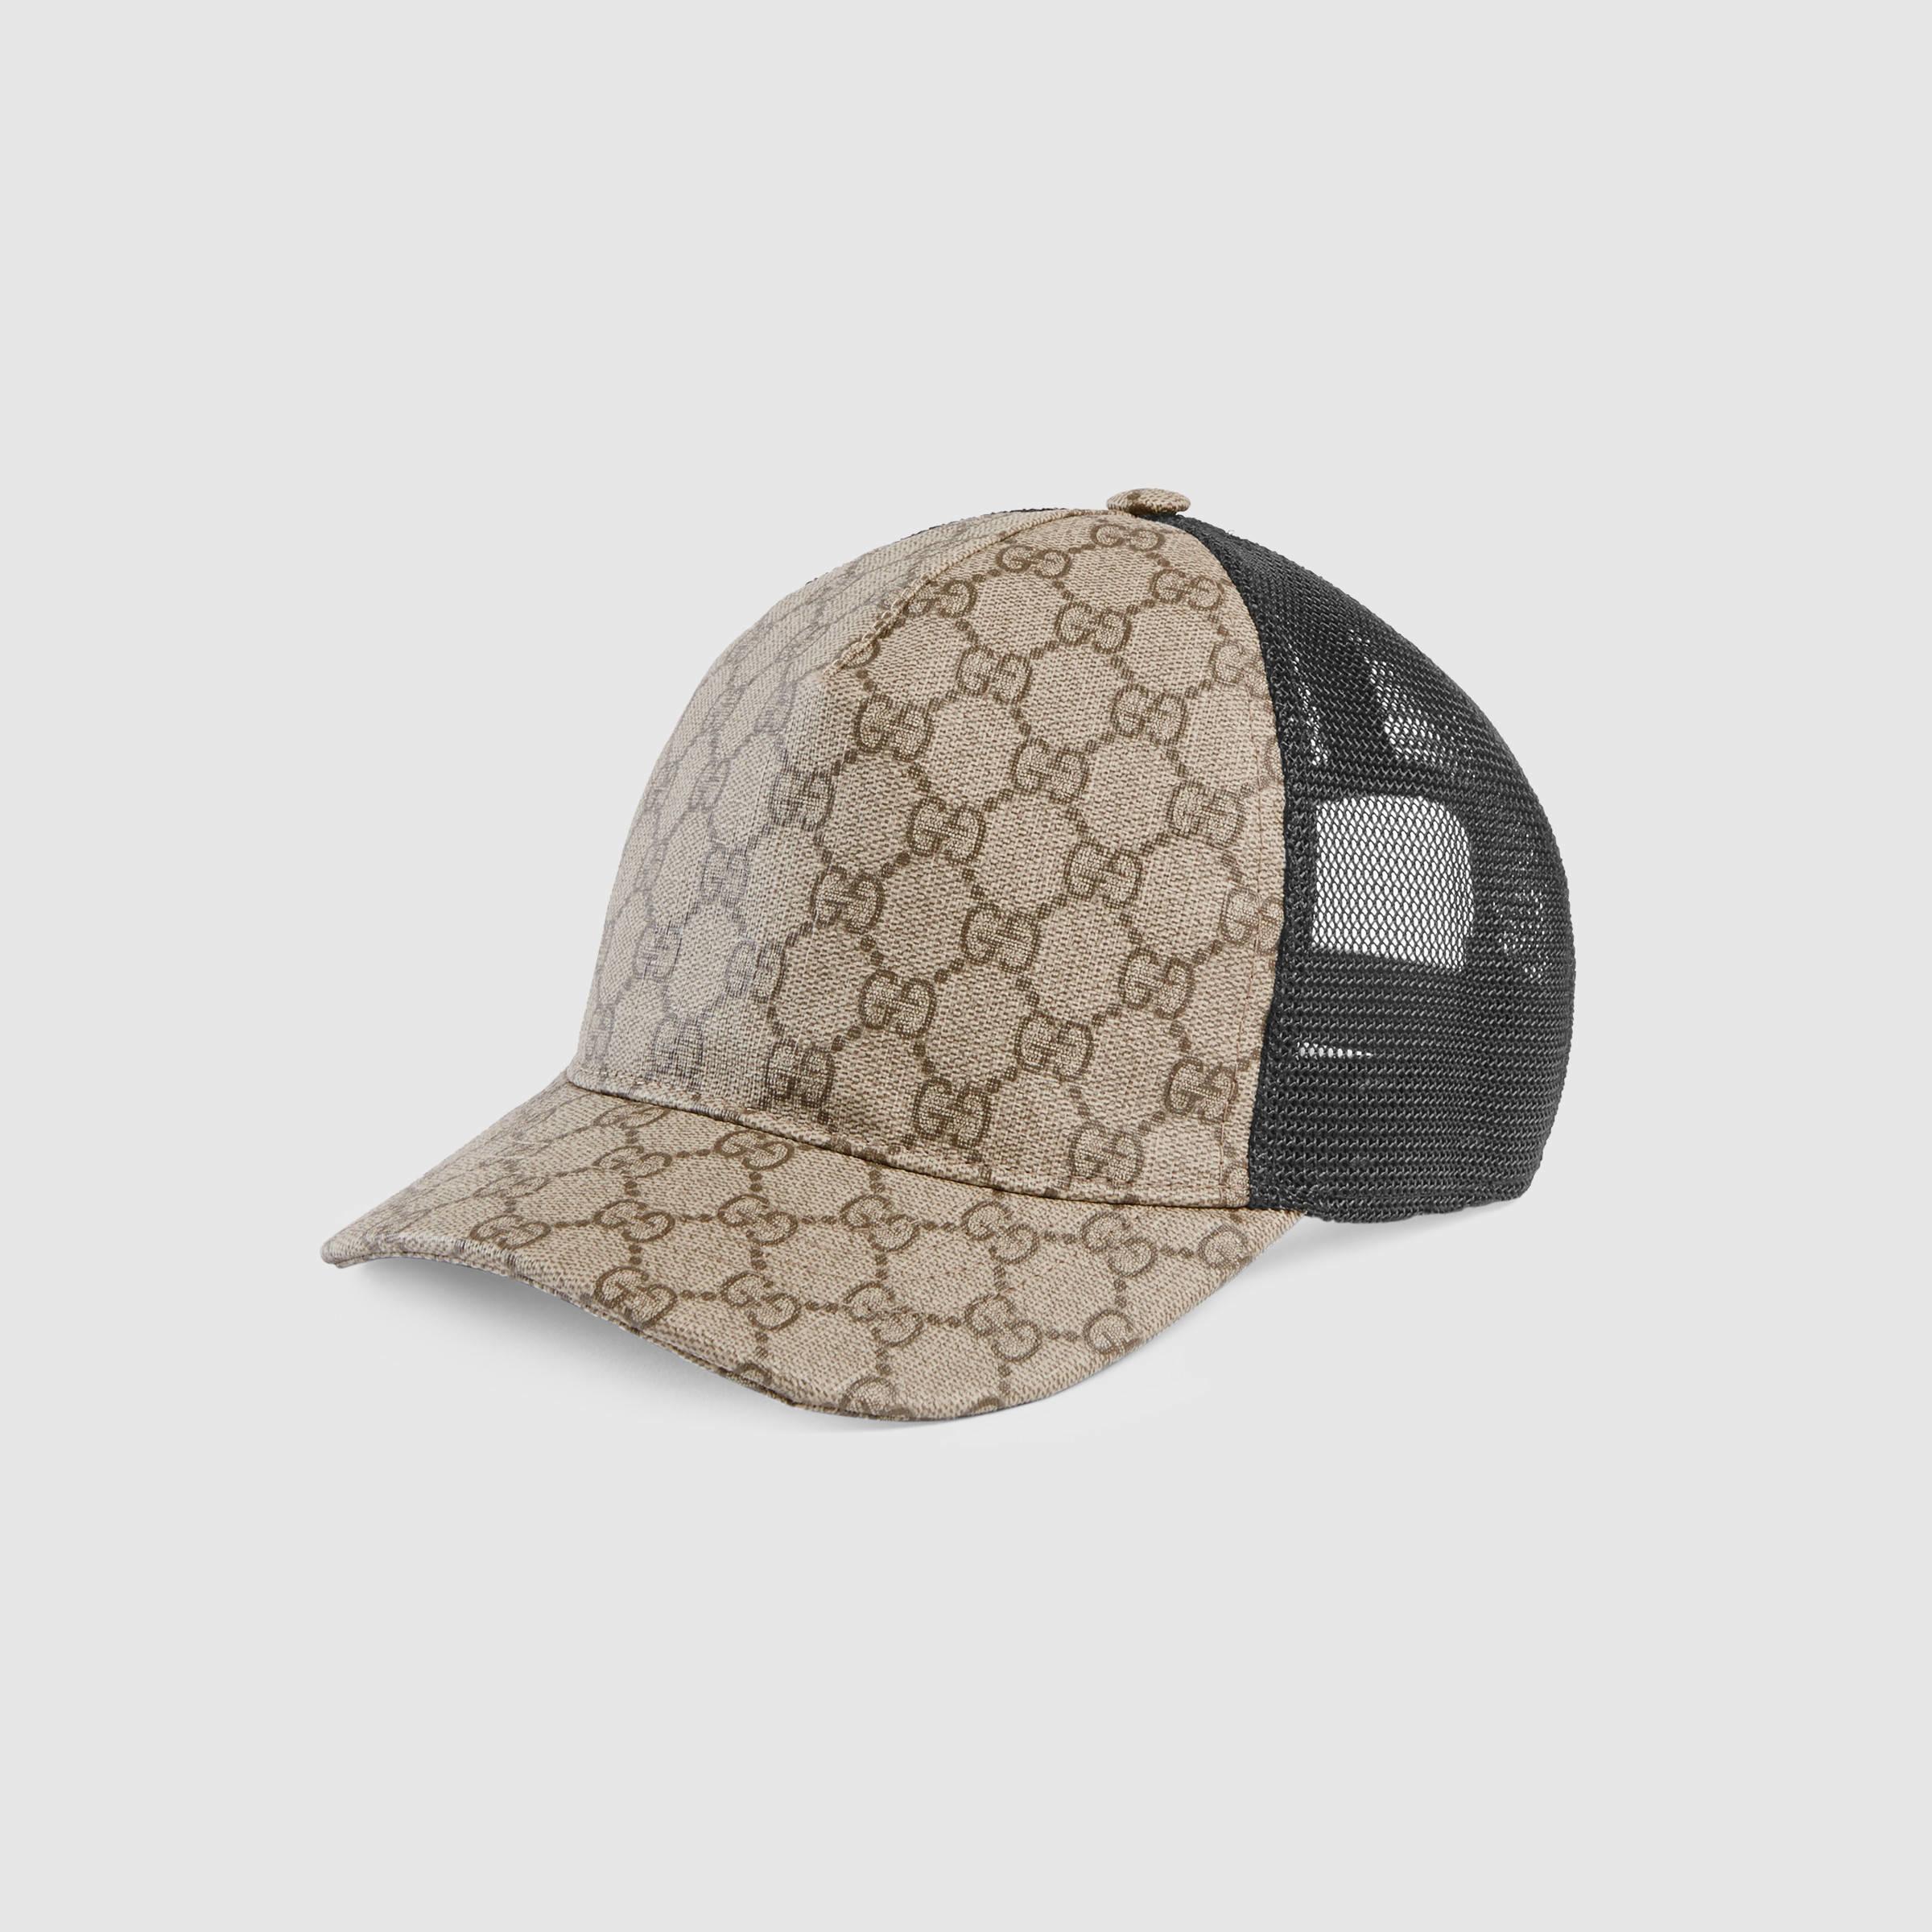 17c59e2db391f Gucci Gg Supreme Baseball Hat For Men